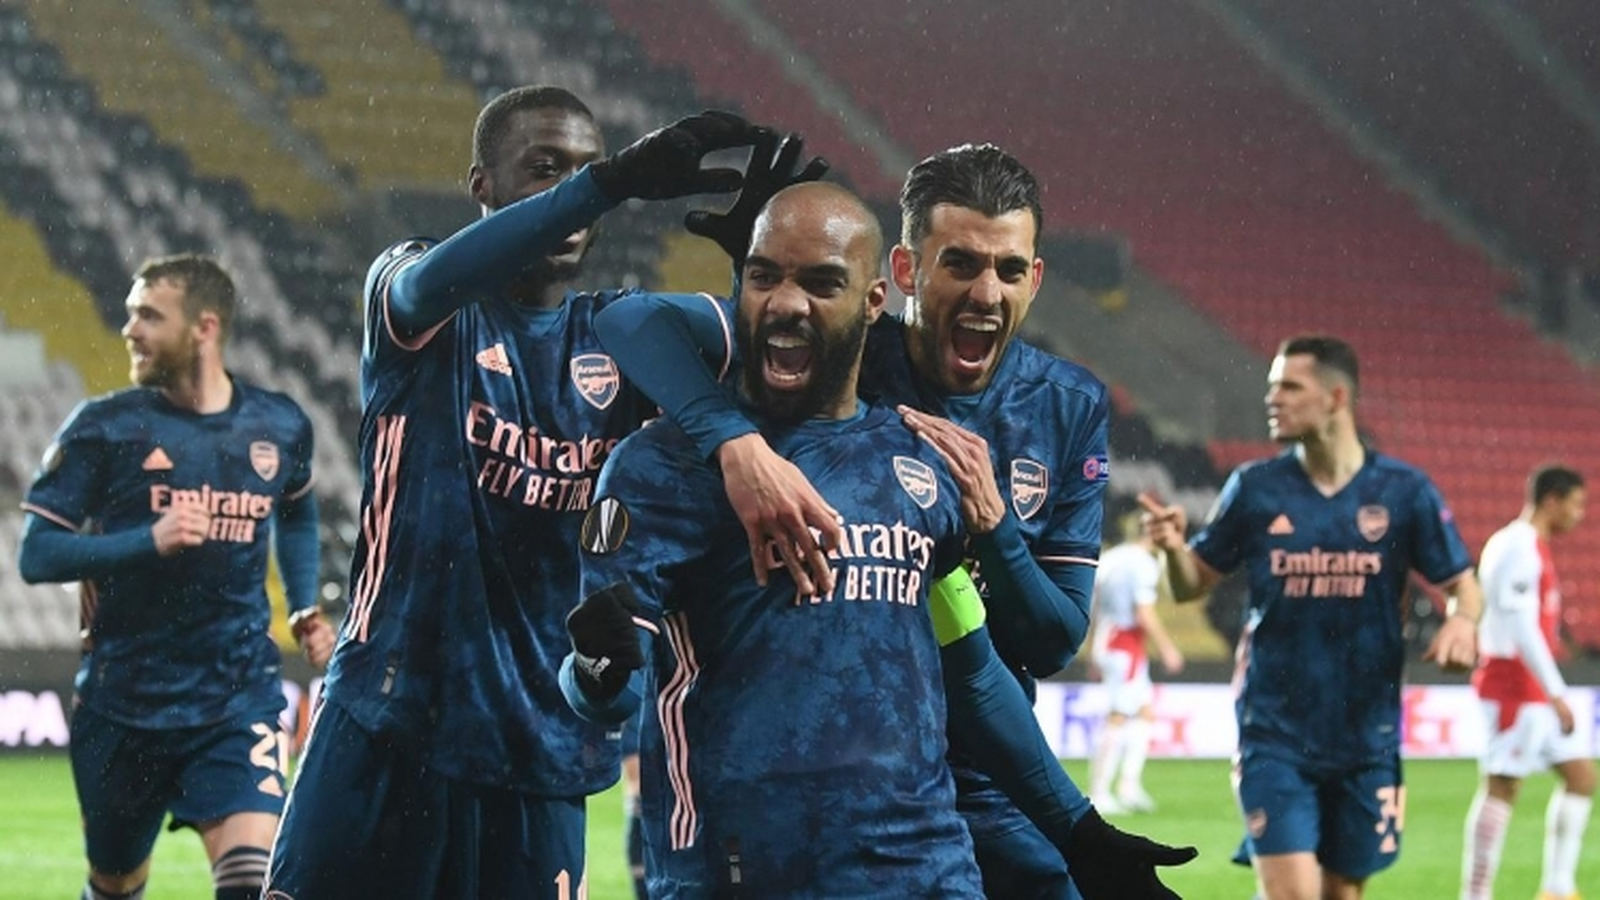 Thắng đậm Slavia Praha, Arsenal thẳng tiến bán kết Europa League